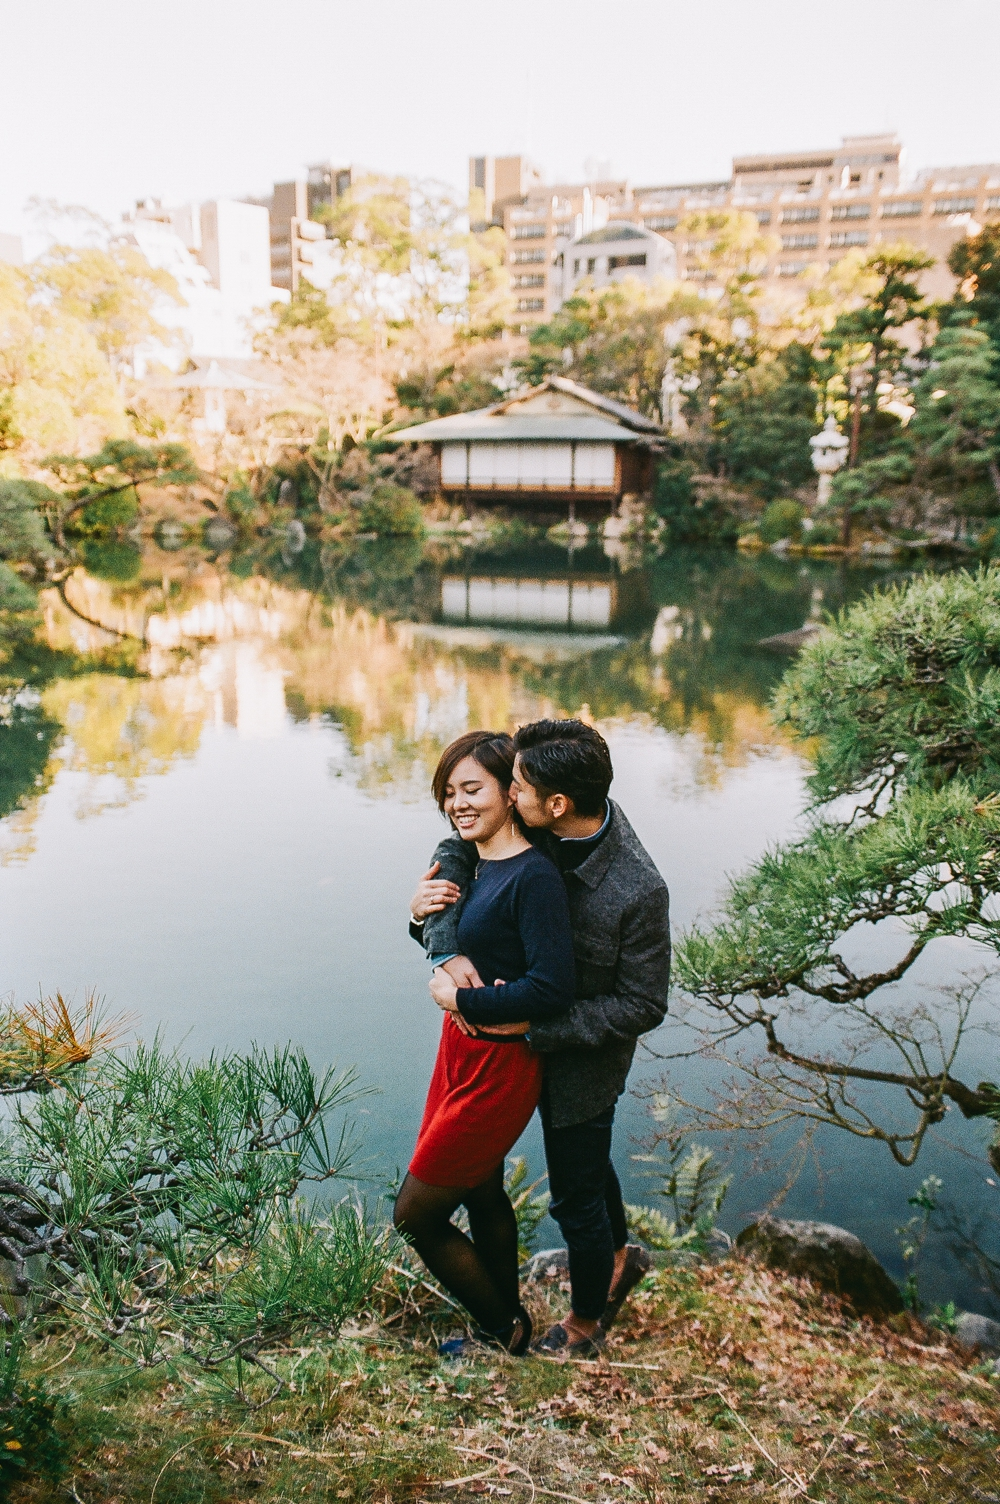 Sorakuen+Garden+Cocoro+and+Kazuya+12.jpg